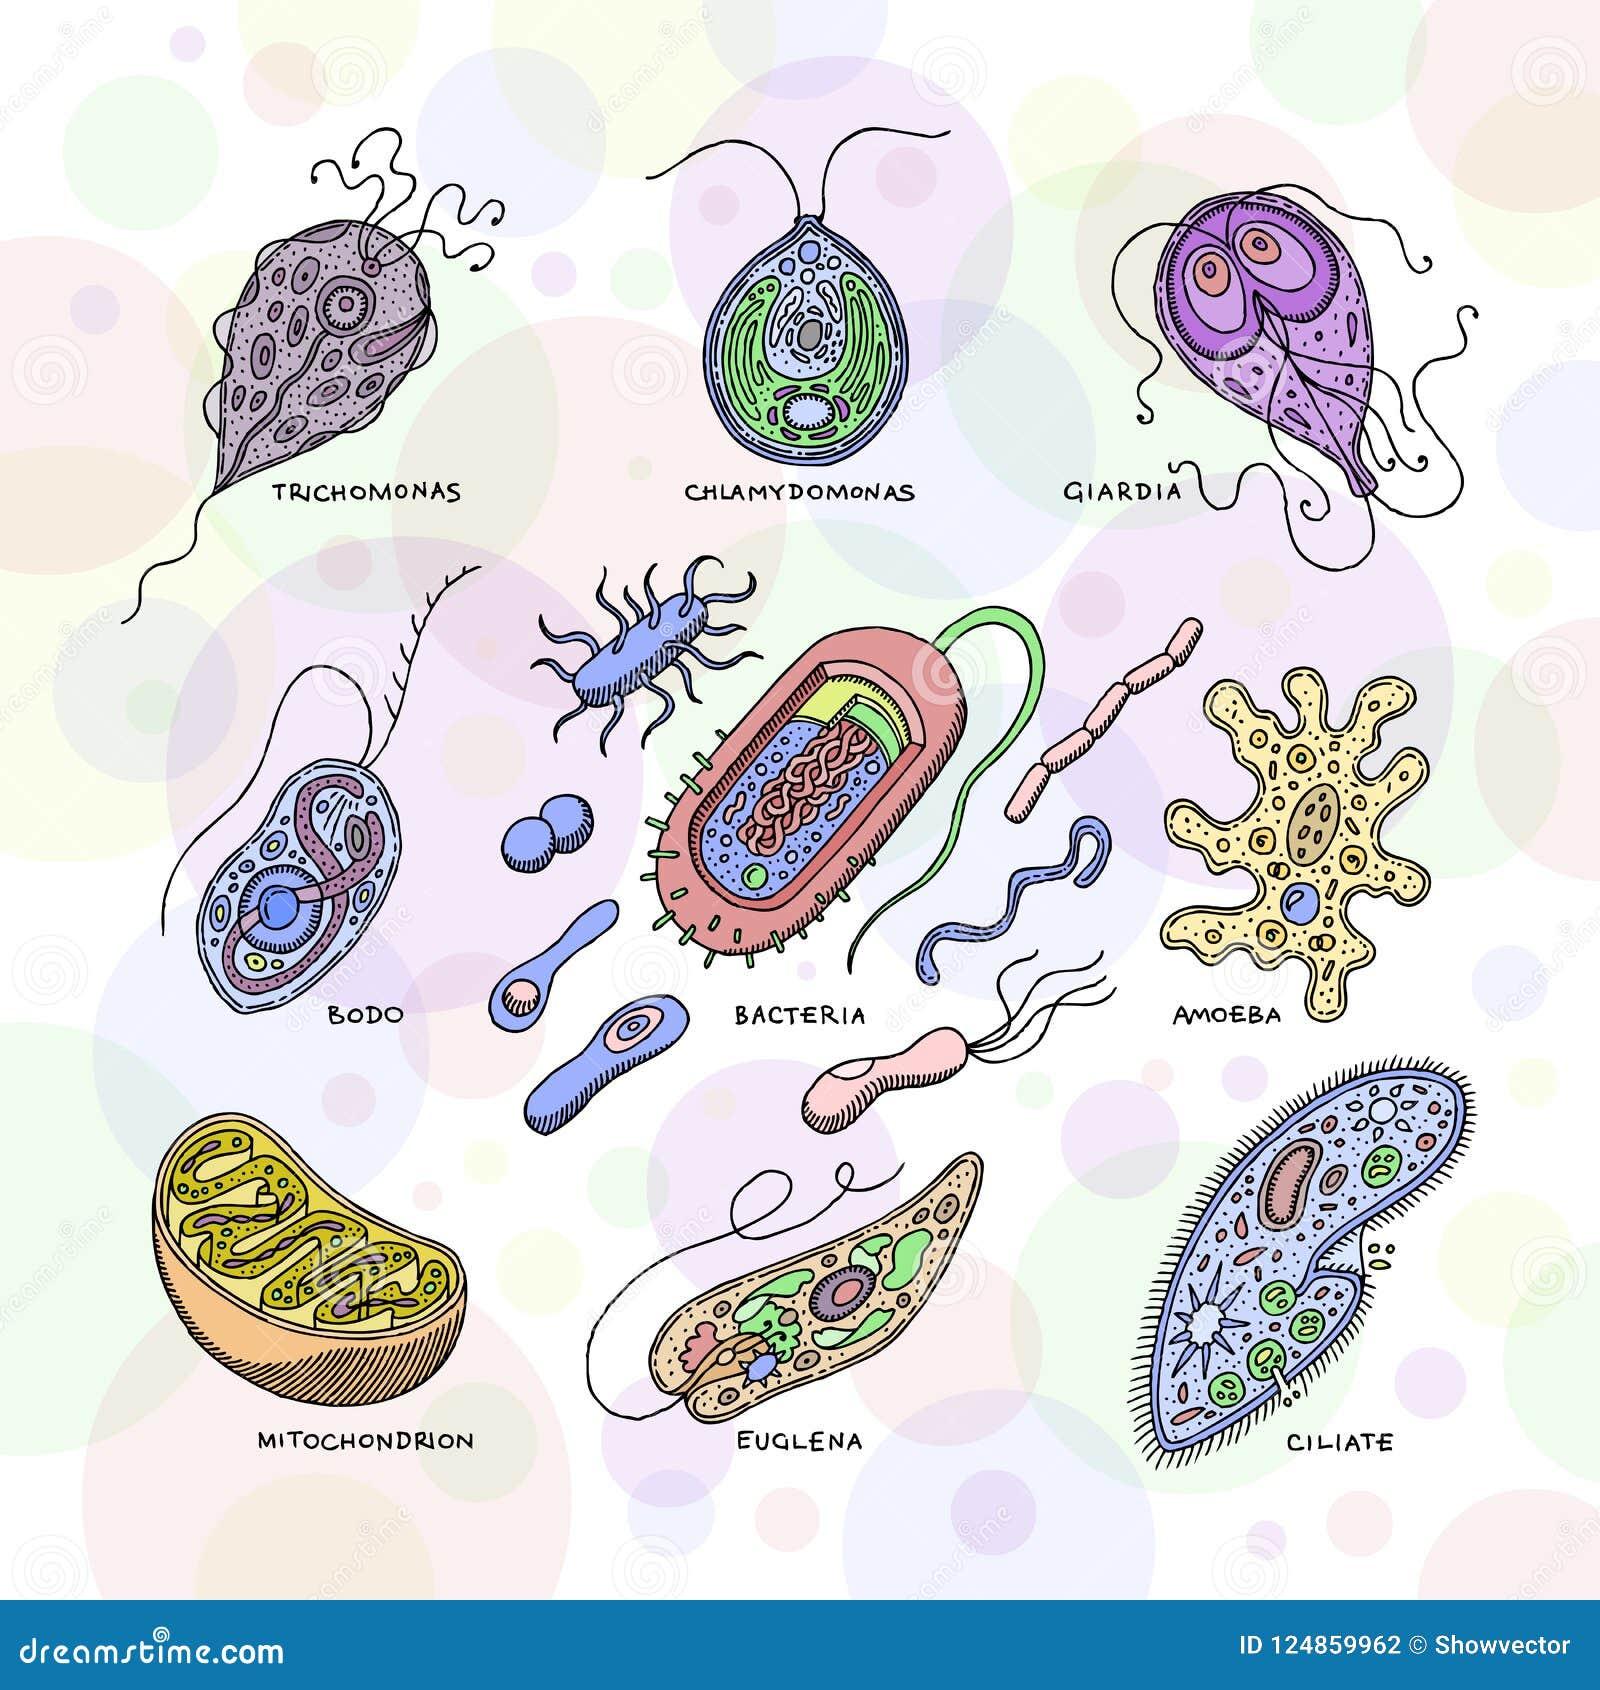 virusul giardiei sau bacteriile)